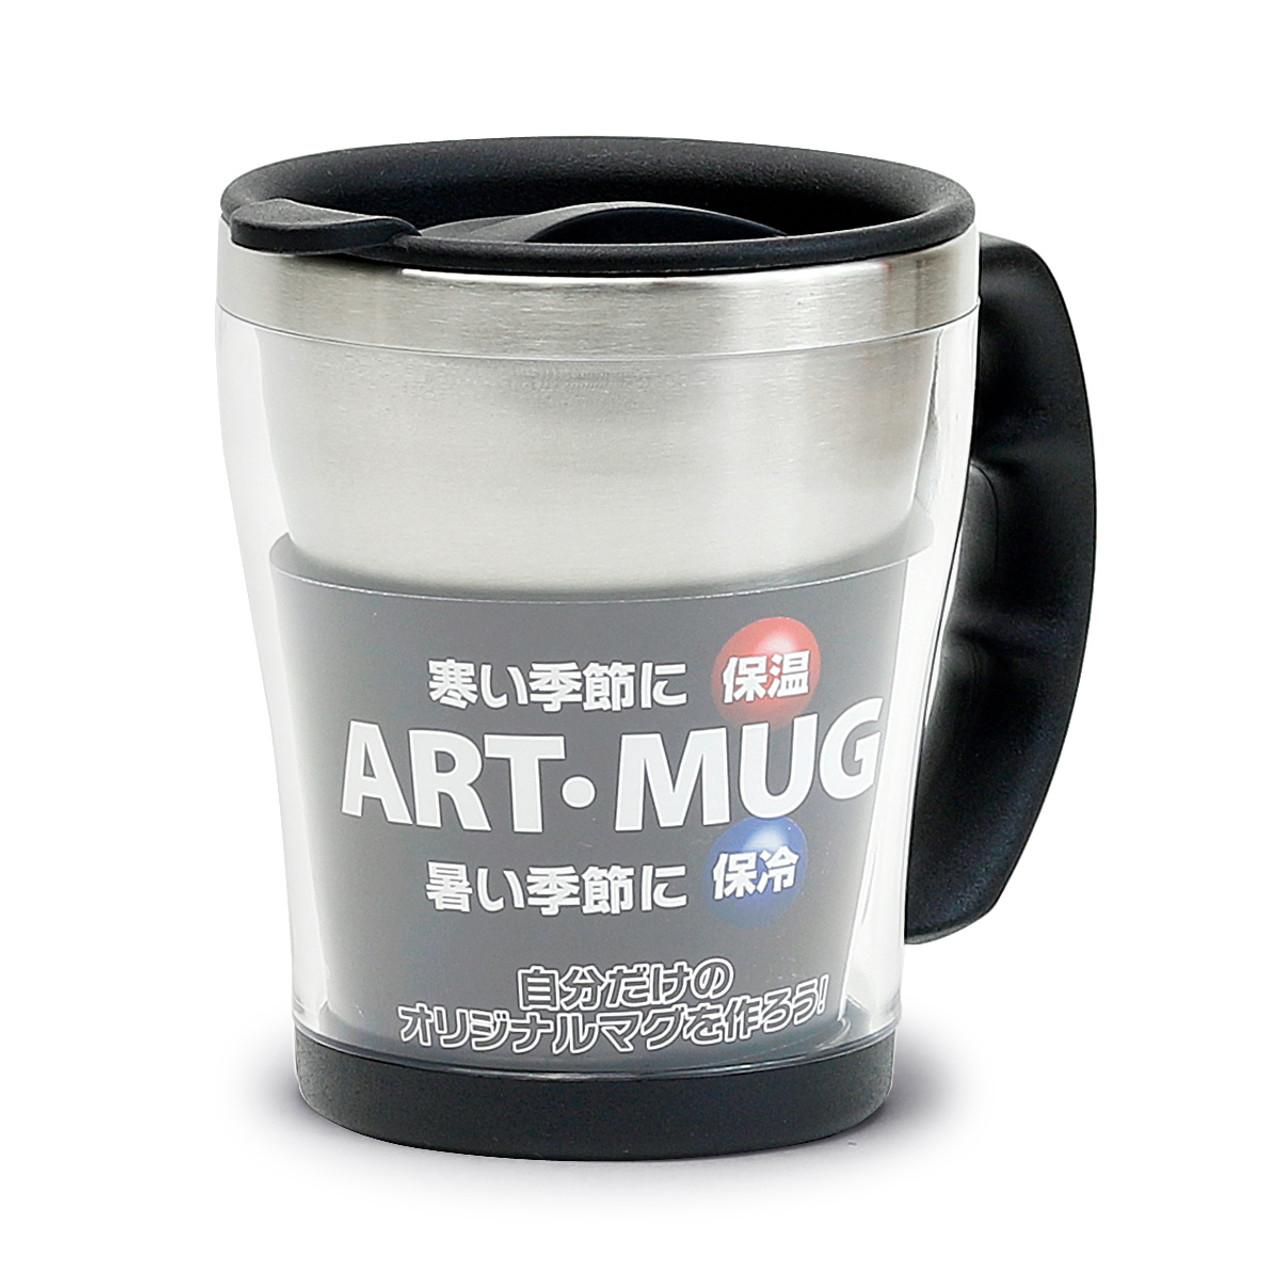 Stainless Steel Diy Vacuum Travel Mug 10 8oz Merae